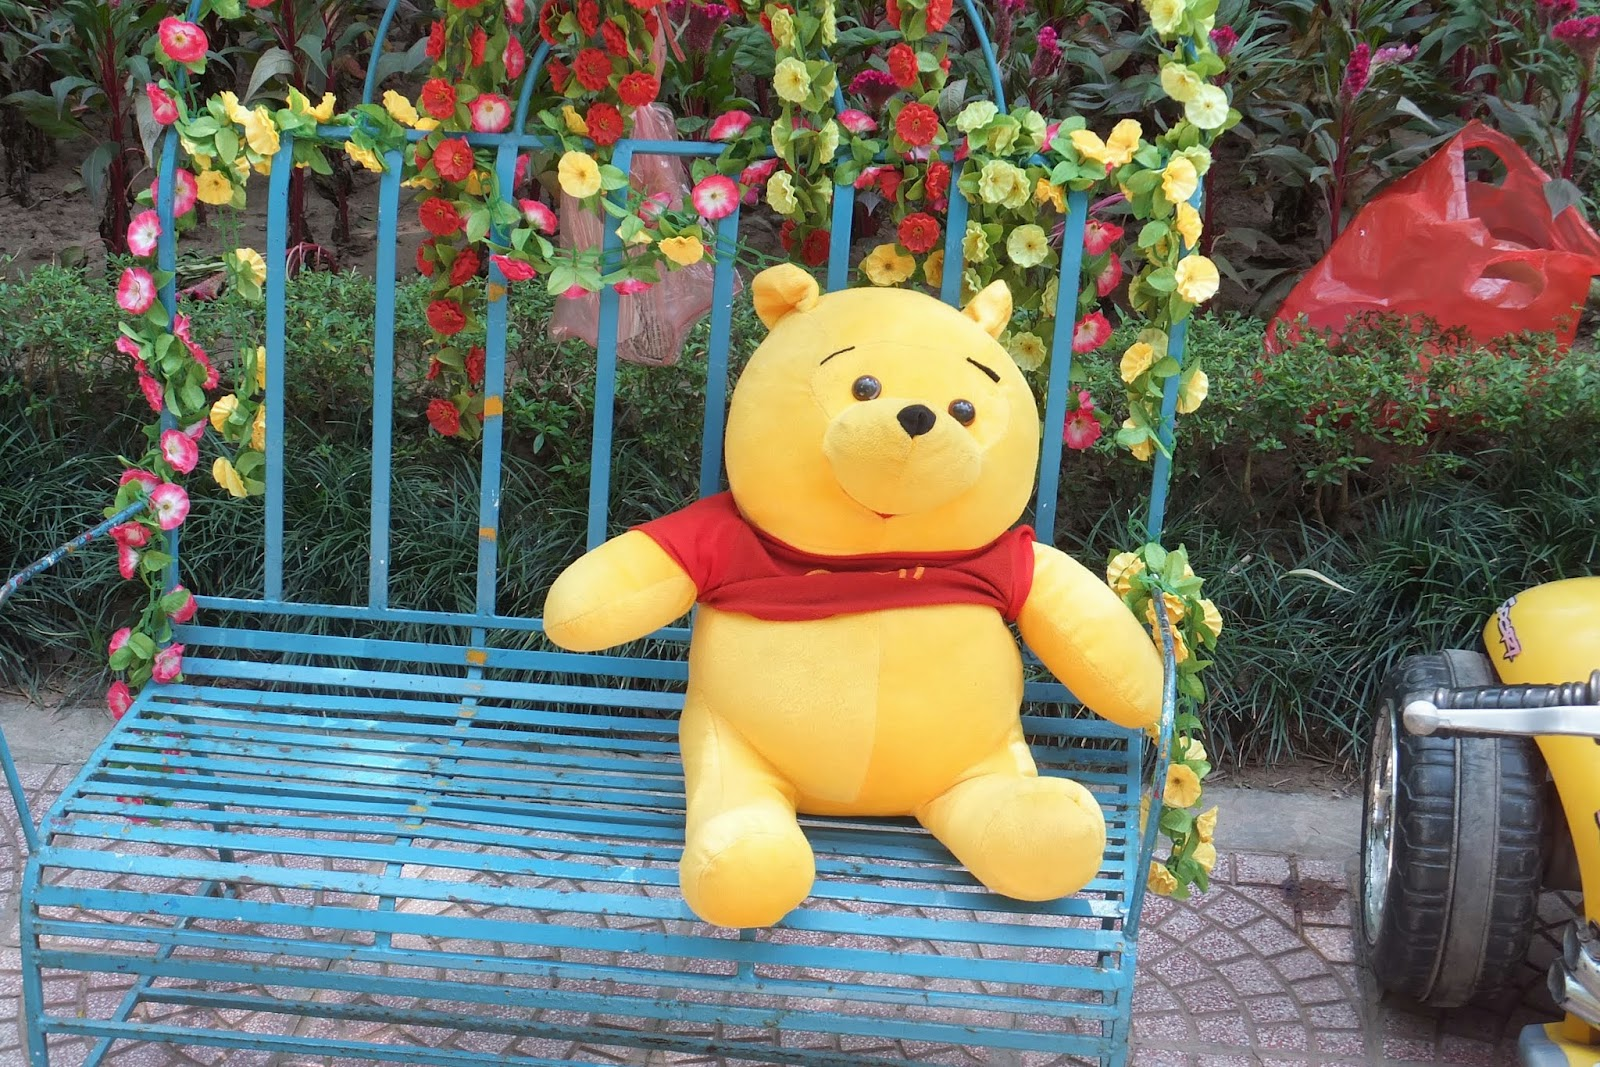 hanoi-zoo-poo ハノイ動物園のプーさん